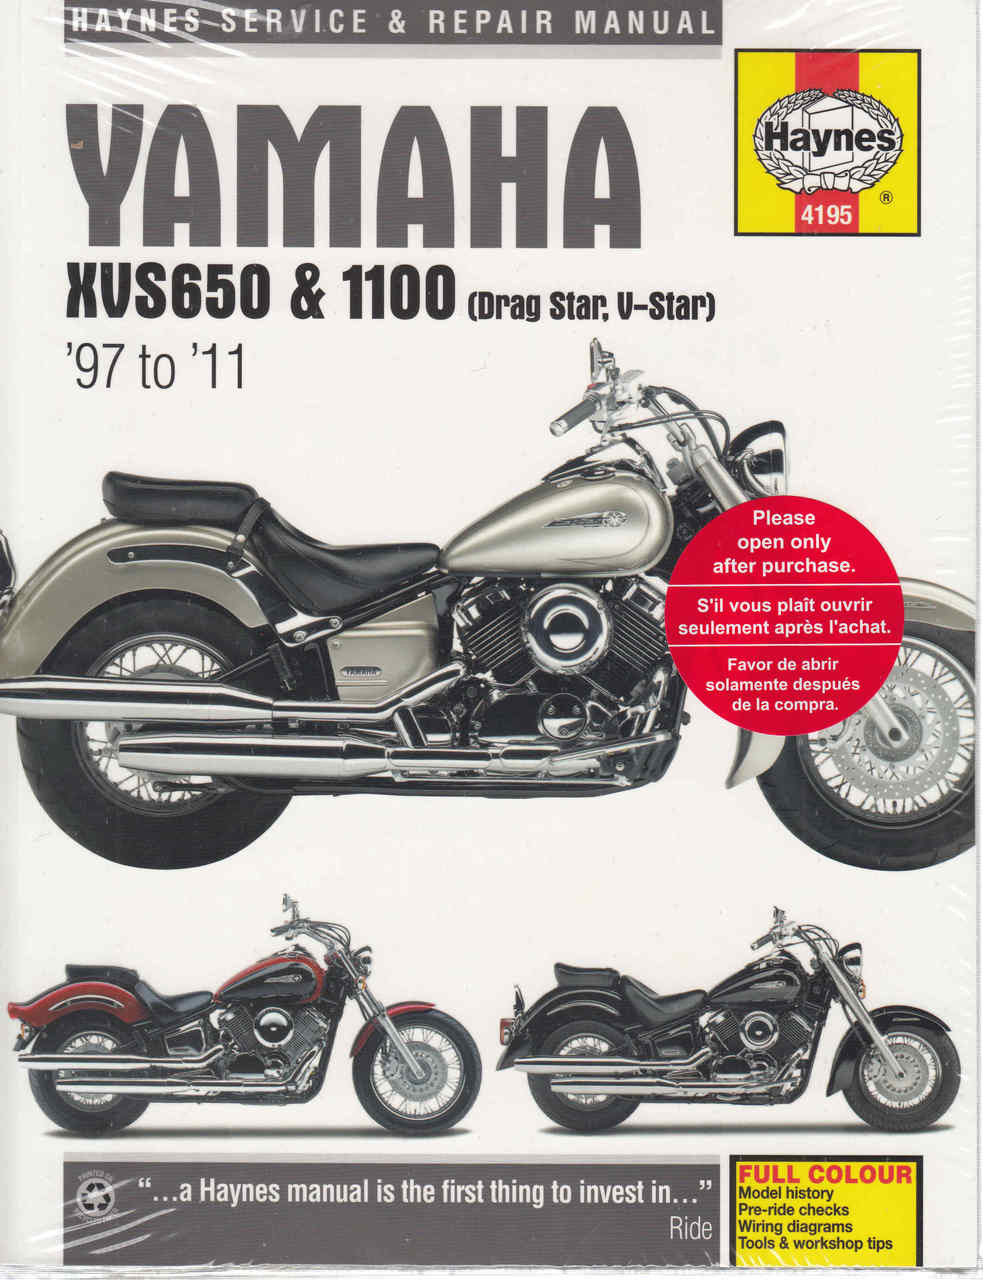 small resolution of yamaha xvs650 amp xvs1100 drag star v star 1997 2005 workshop manual